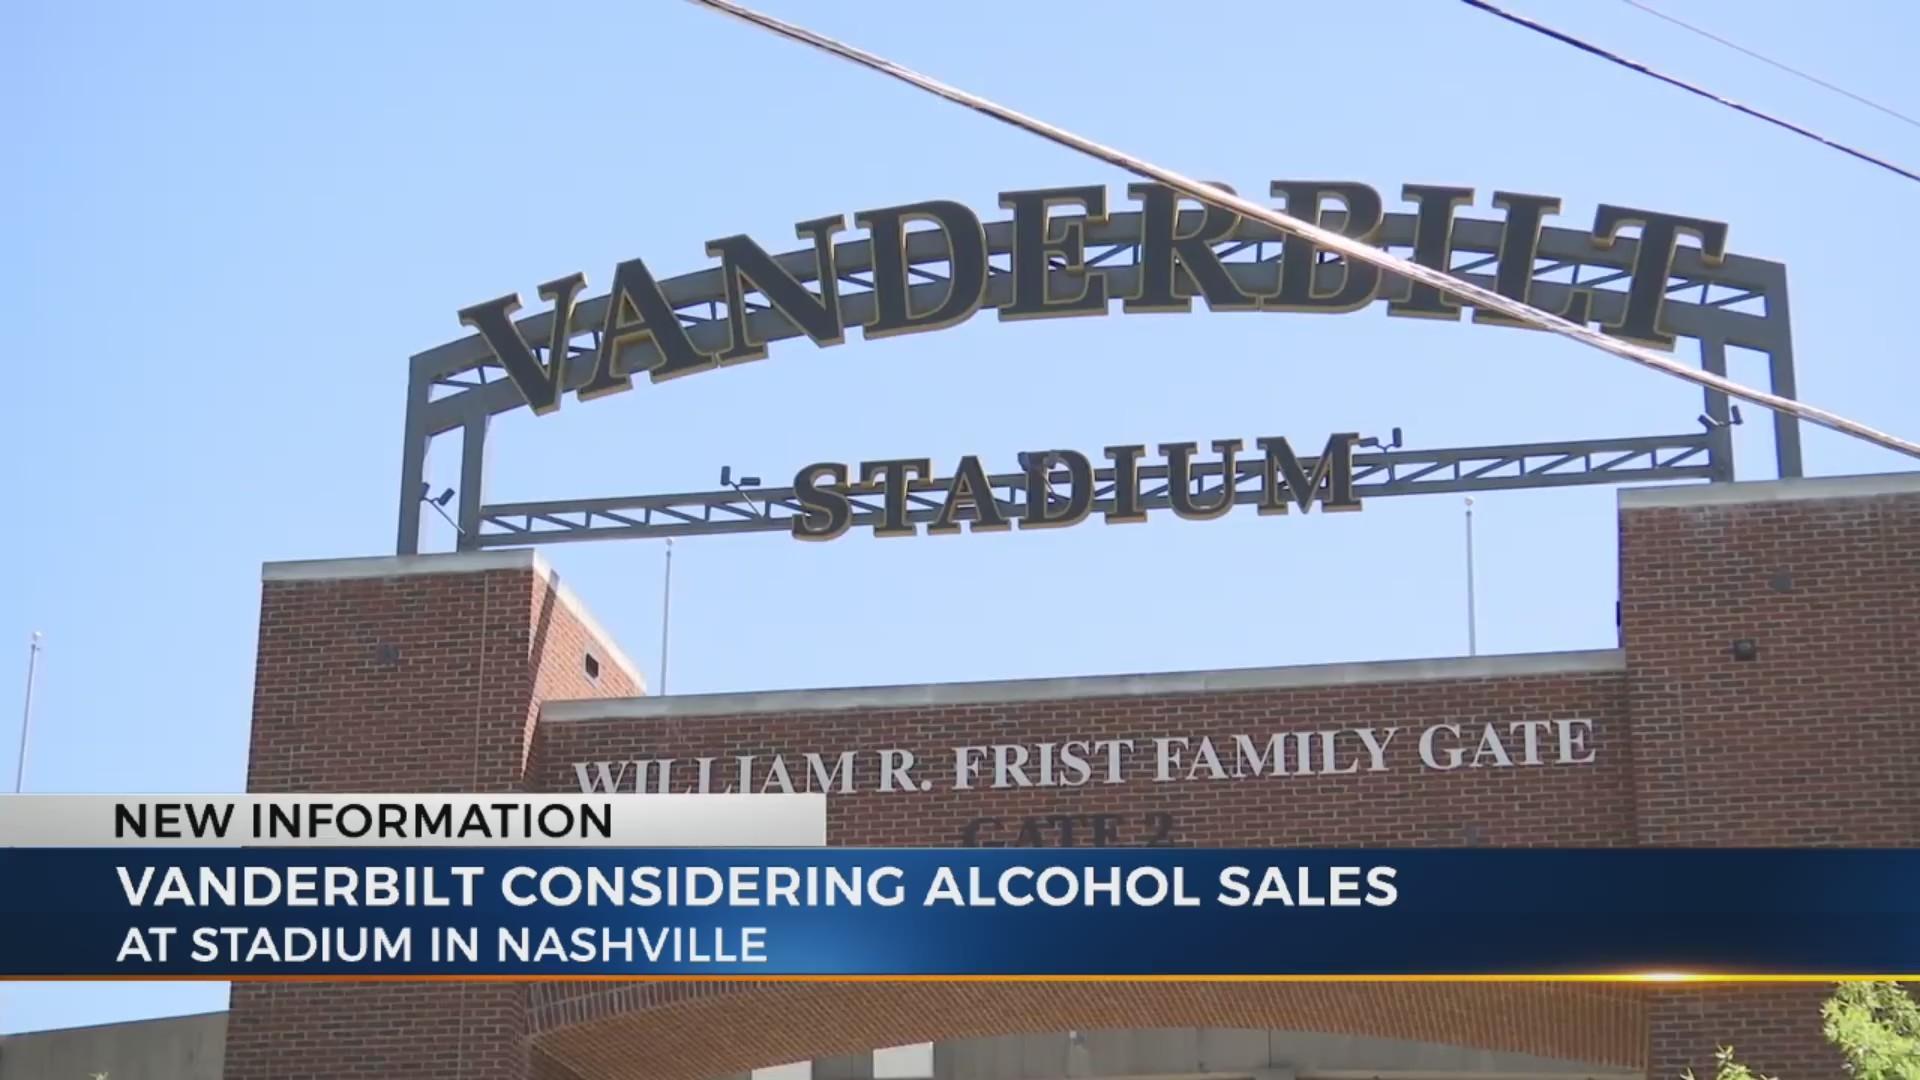 Vanderbilt_considering_alcohol_sales_0_20190614215639